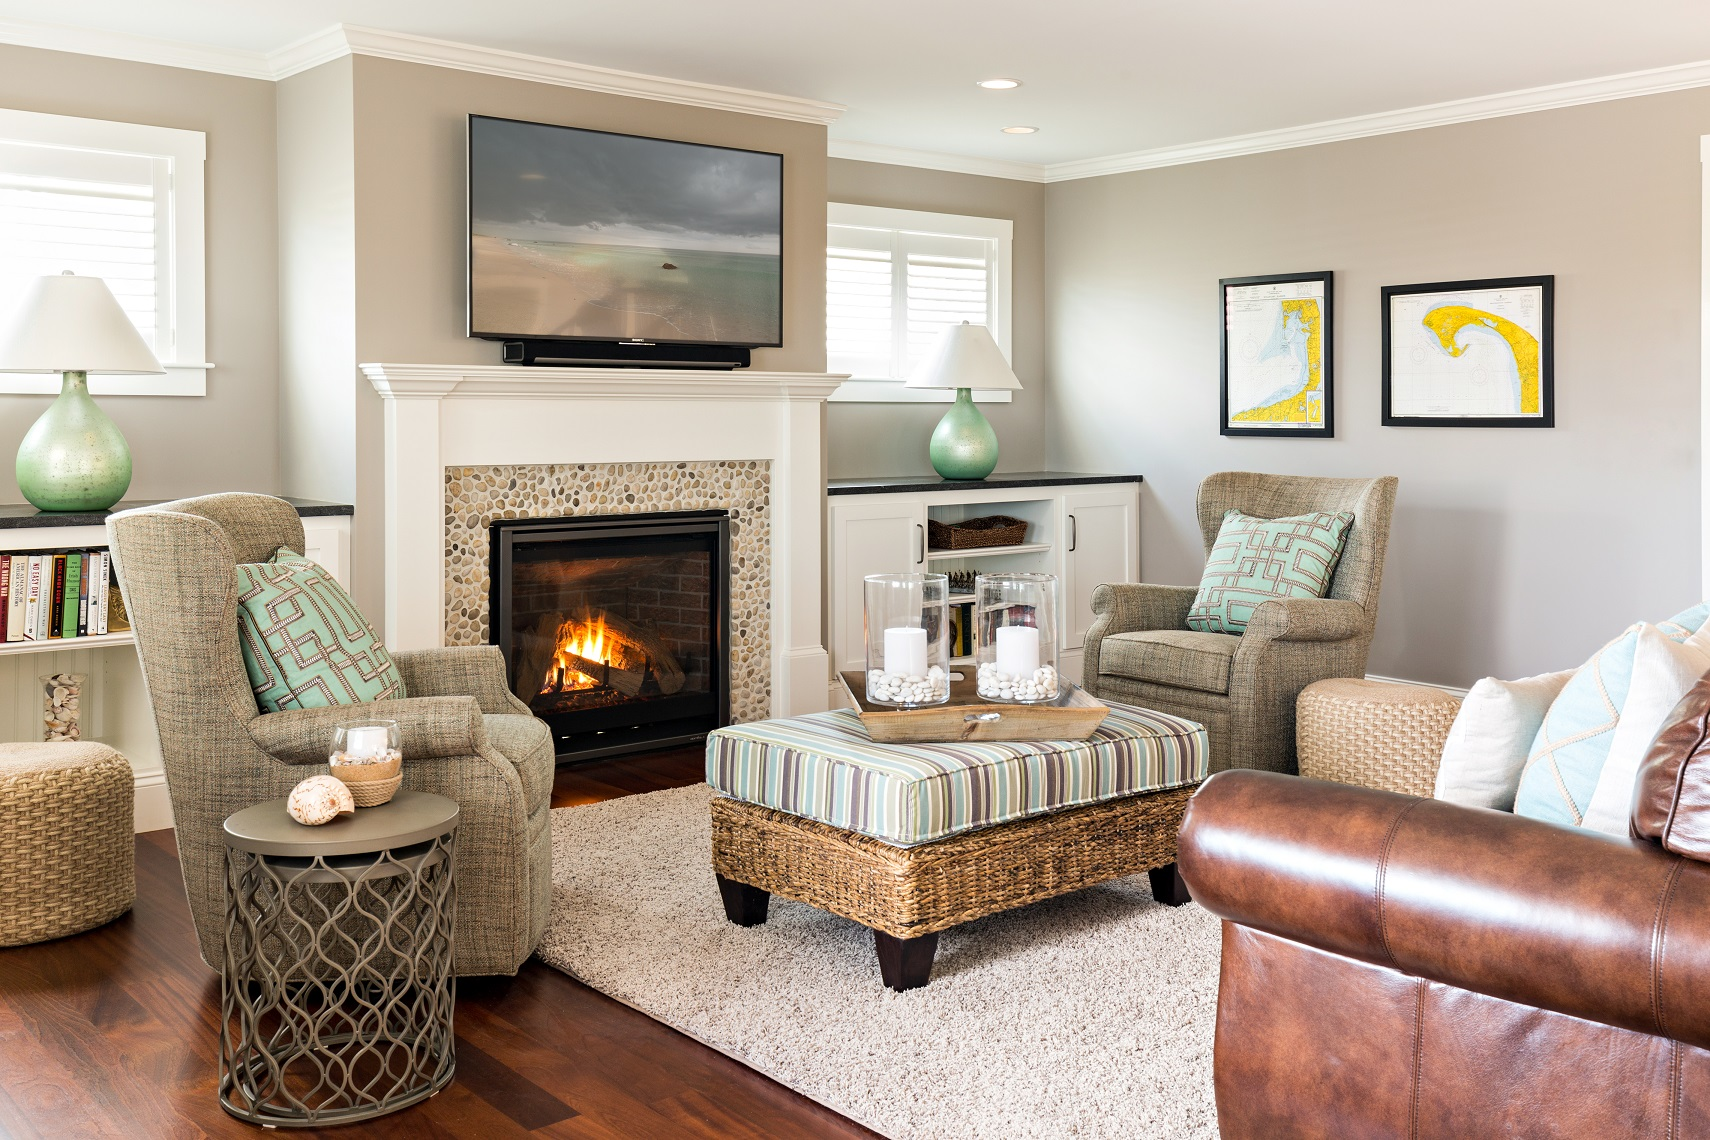 Northside_Bayview_Cape_living_room_web.jpg